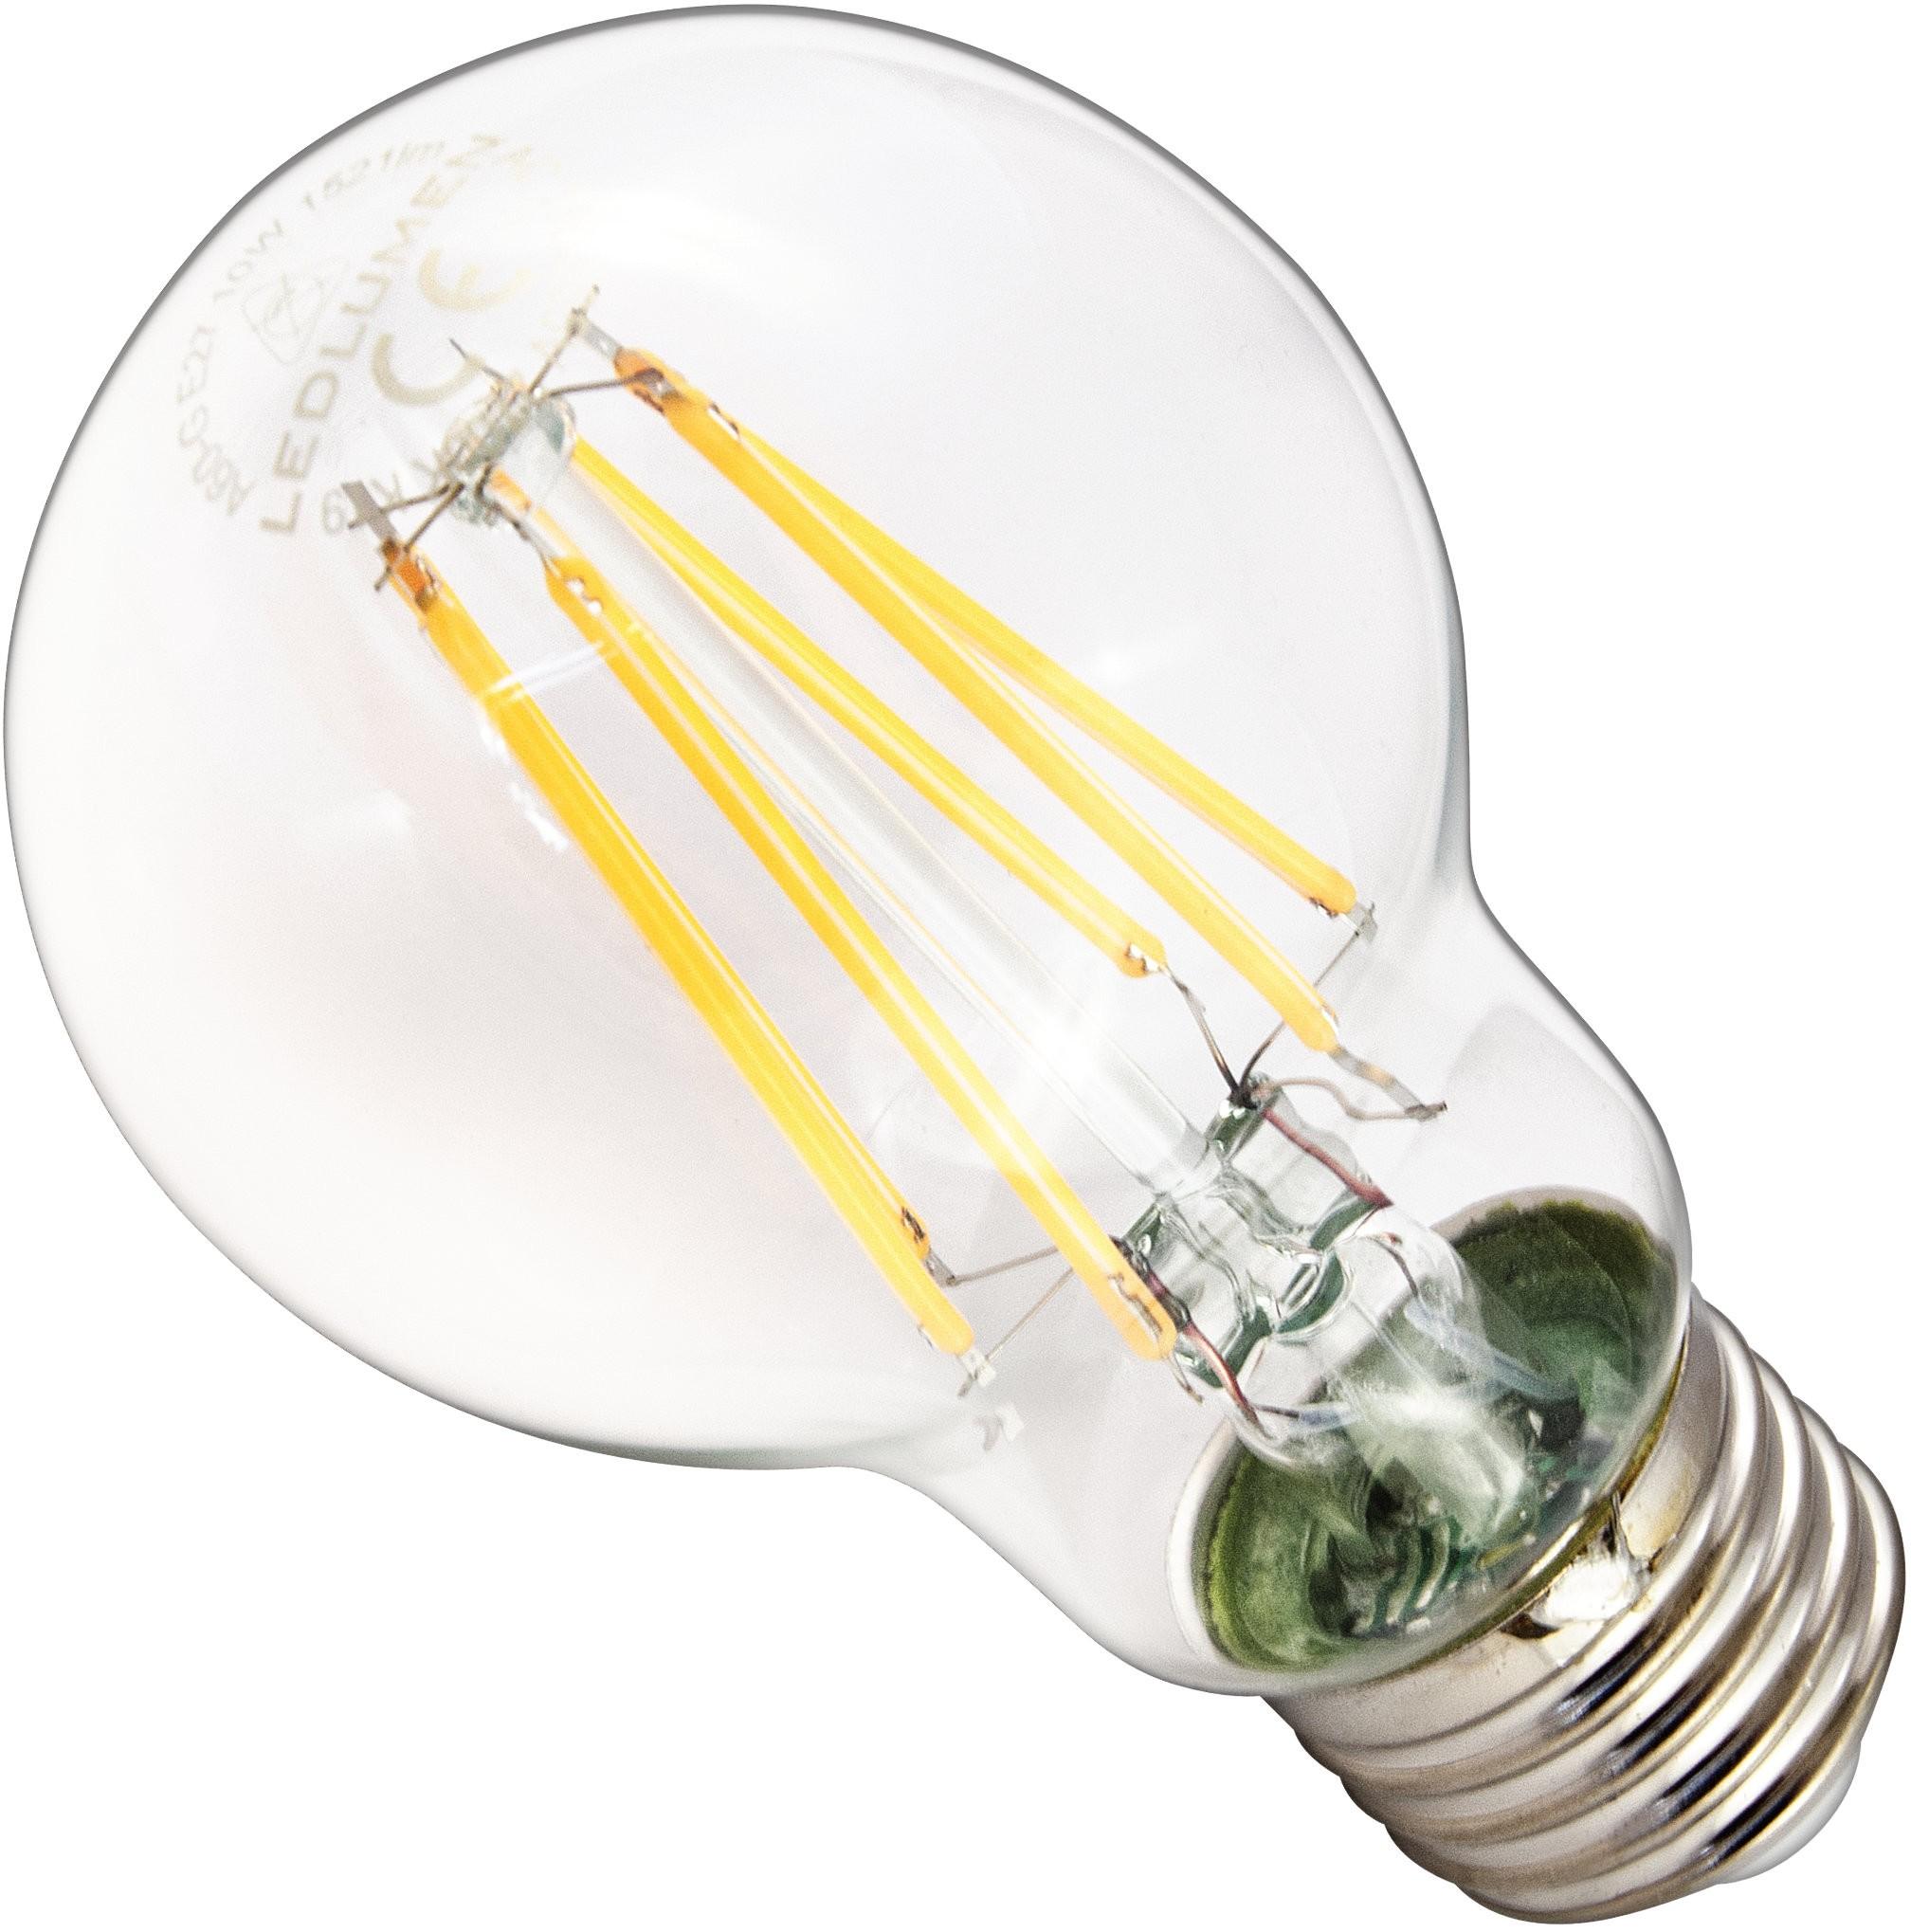 LEDlumen Żarówka LED A60-G E27 230V 10W FILAMENT 1521lm WW 251090392